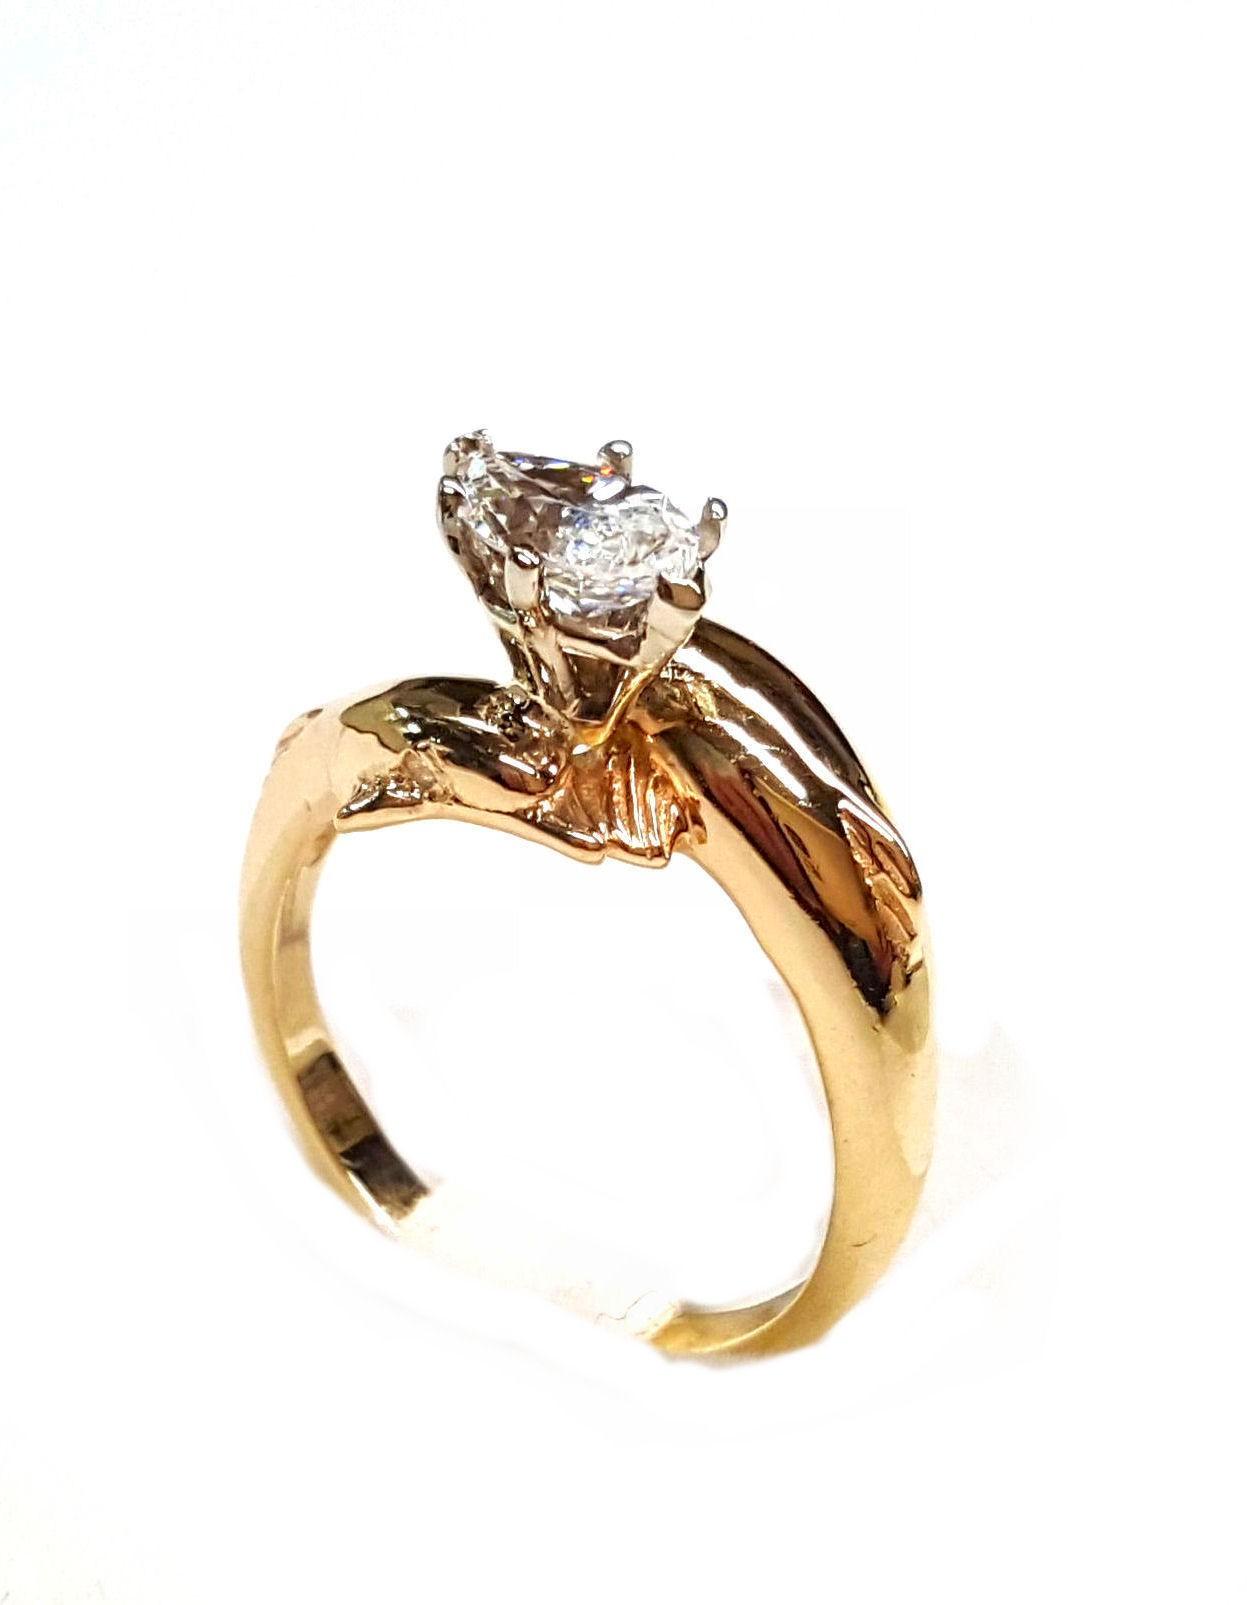 2 full dolphin diamond engagement ring 1 4ct marquise center dolphin wedding rings 2 Full Dolphin Diamond Engagement Ring 1 4ct Marquise Center